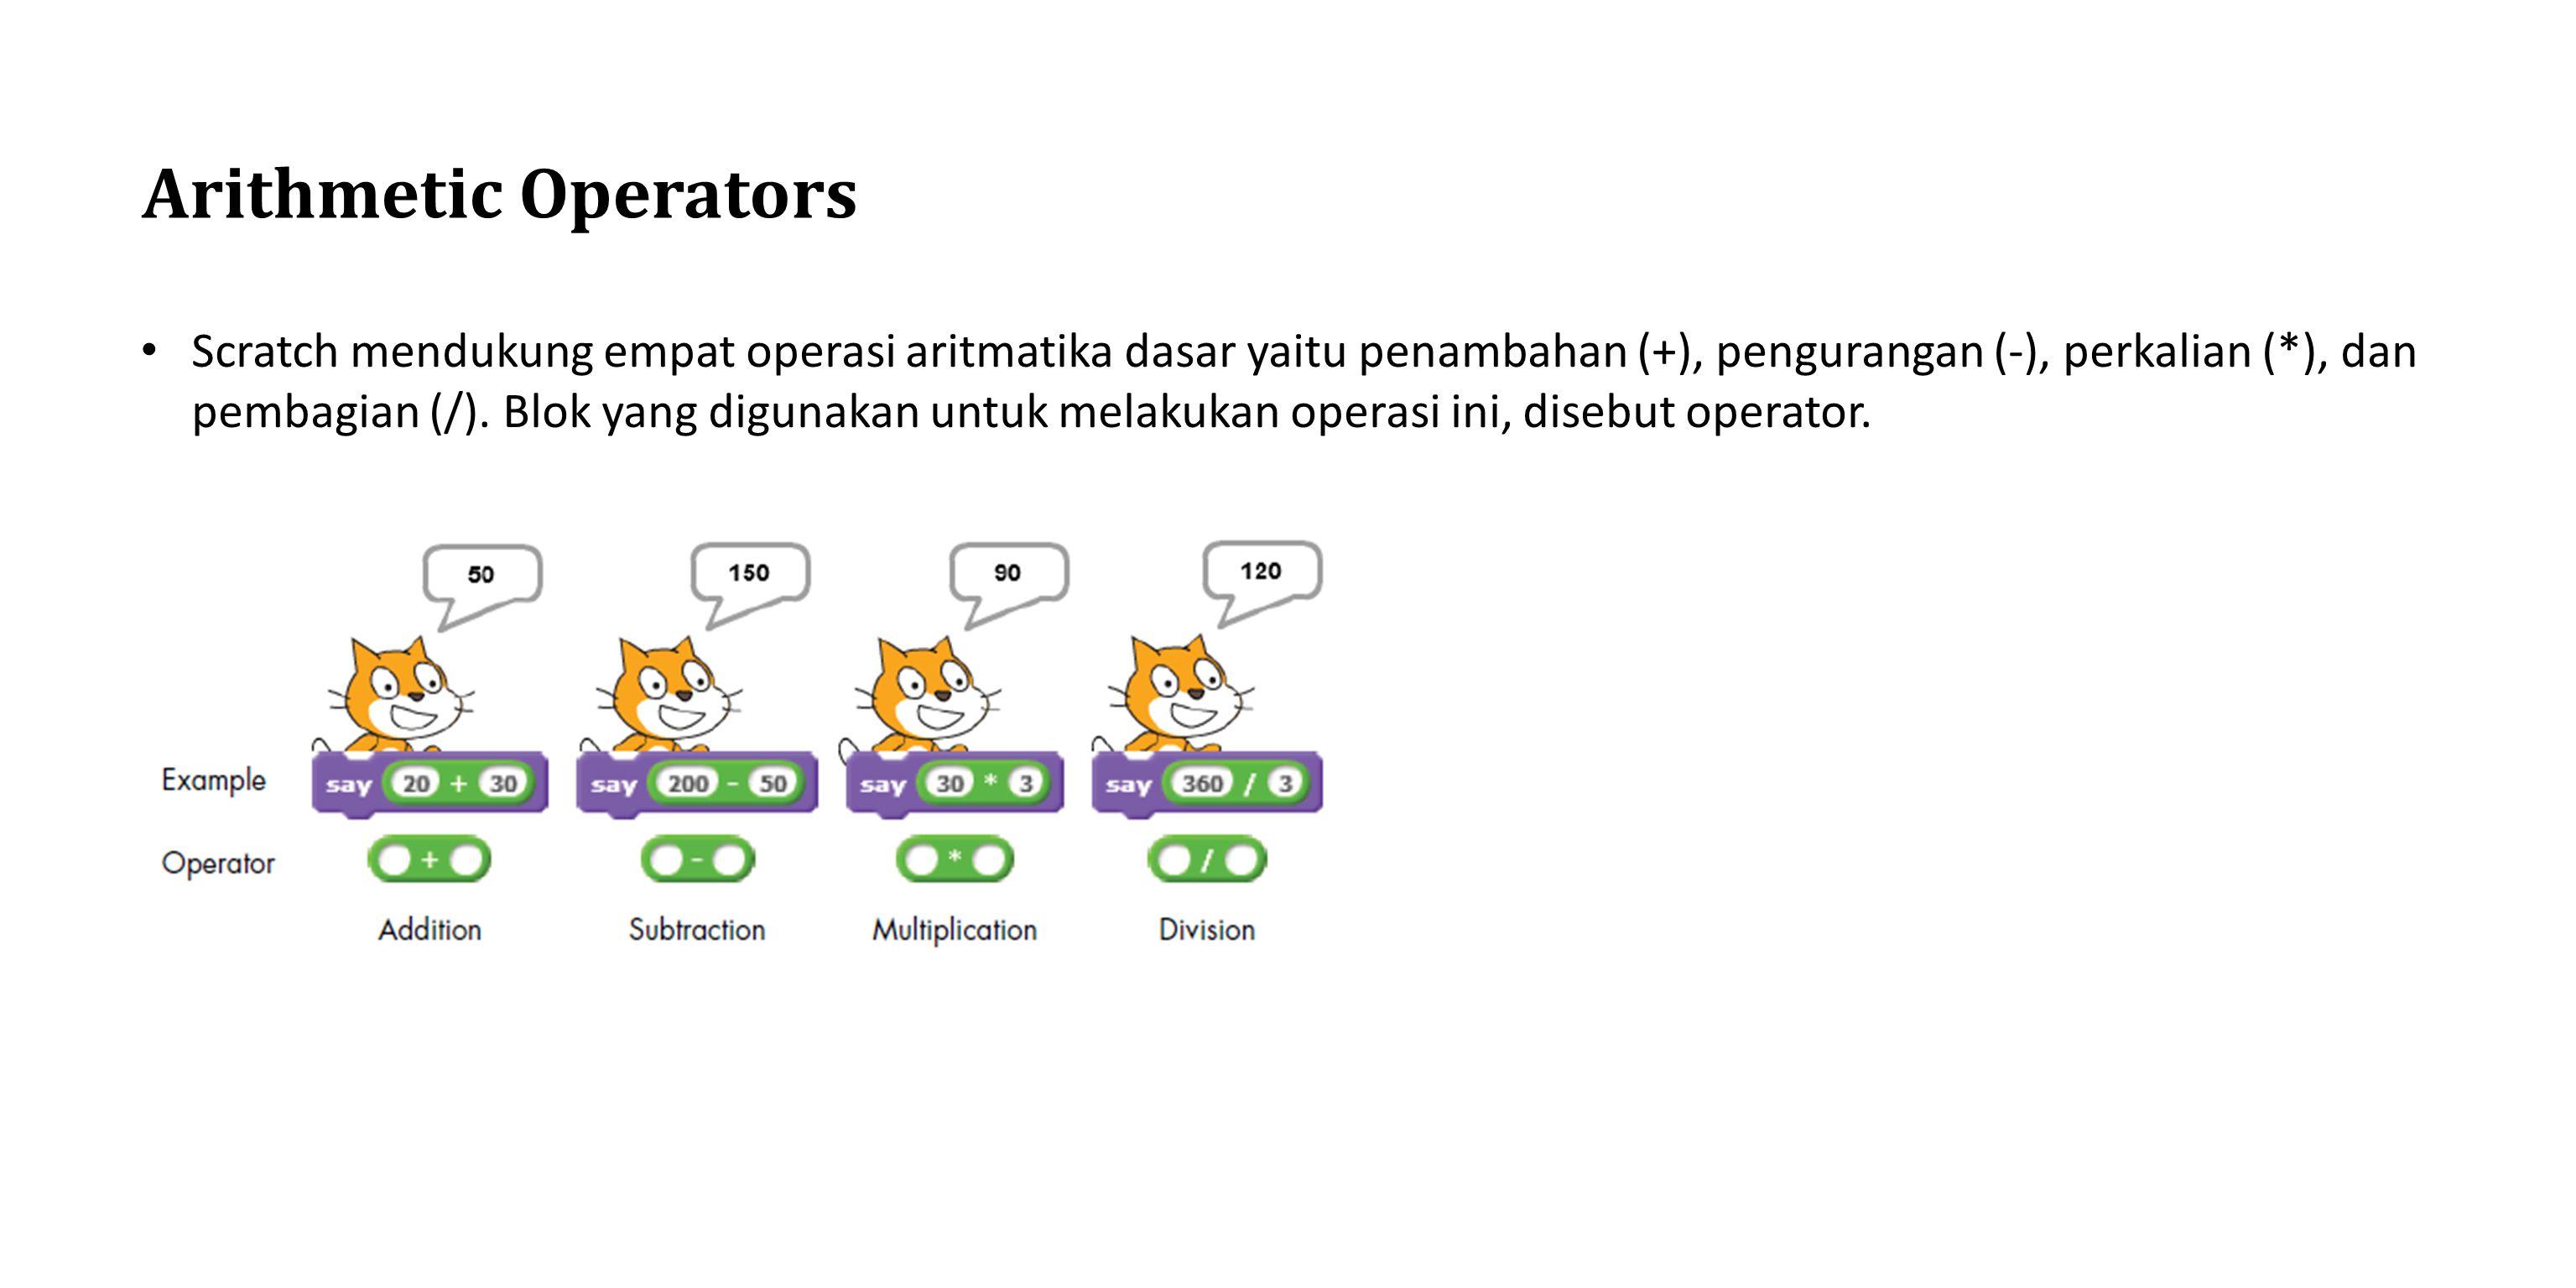 Arithmetic Operators Scratch mendukung empat operasi aritmatika dasar yaitu penambahan (+), pengurangan (-), perkalian (*), dan pembagian (/). Blok ya